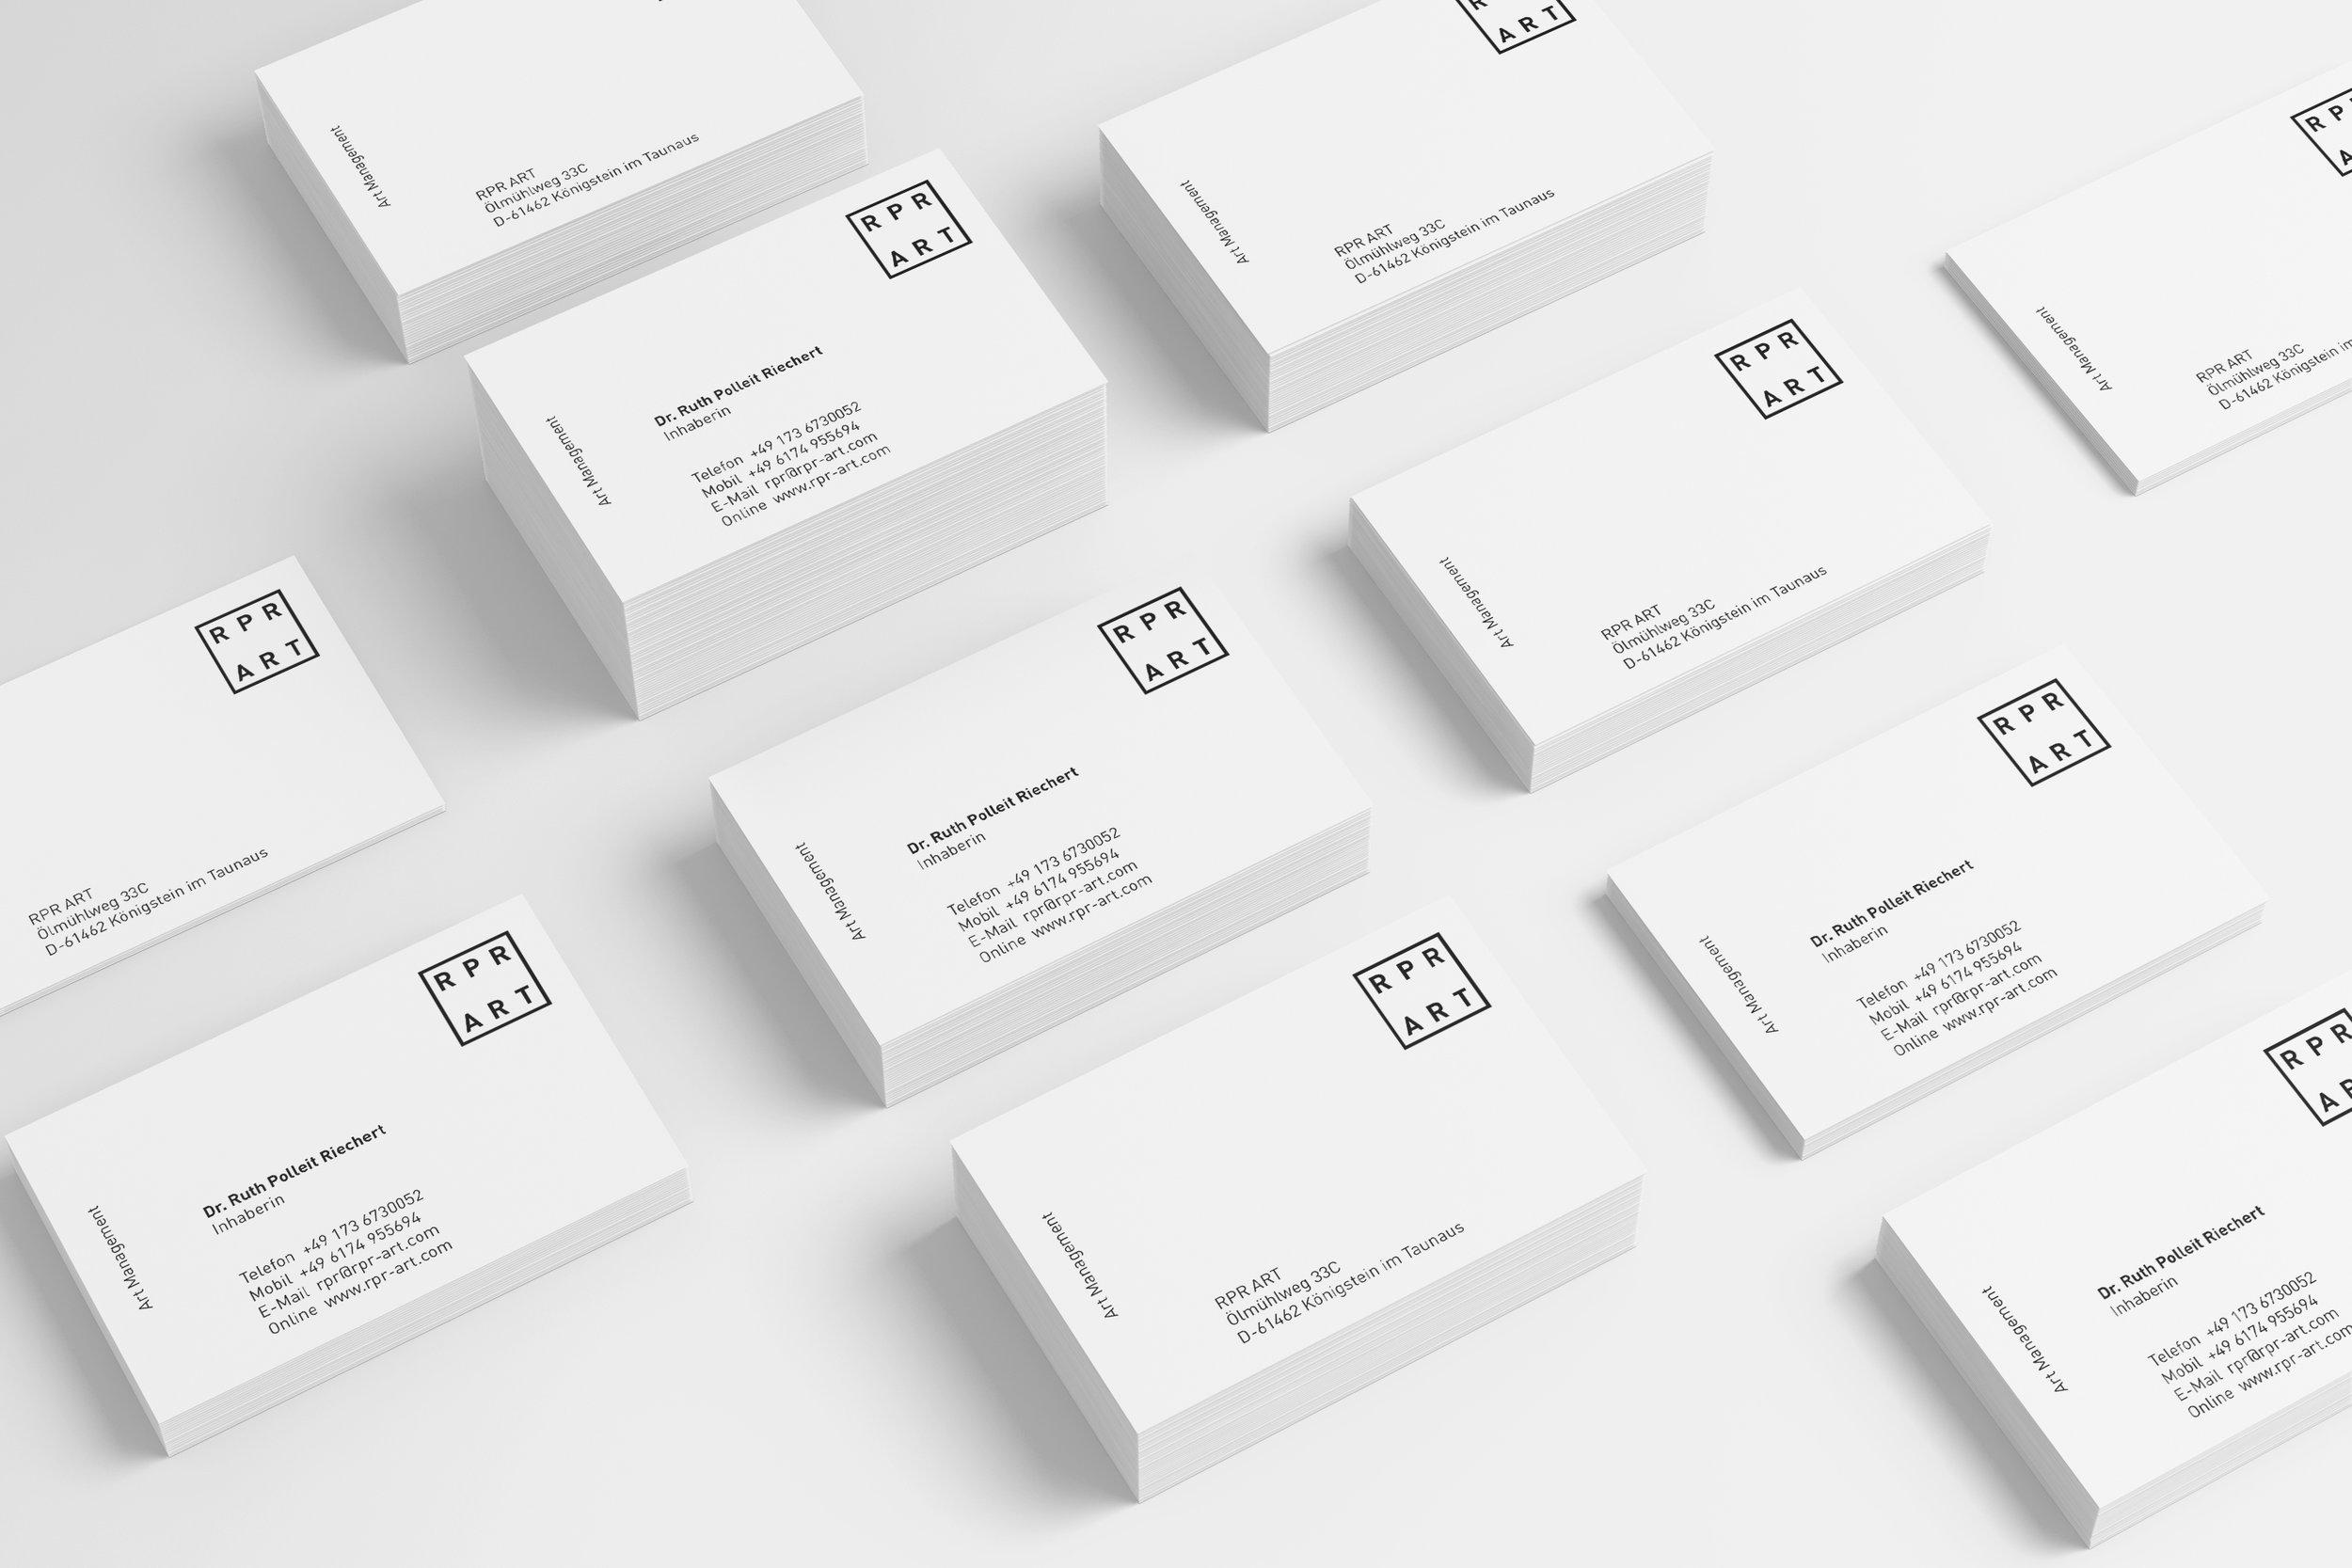 blank_rpr-art_corporate-design_1.jpg